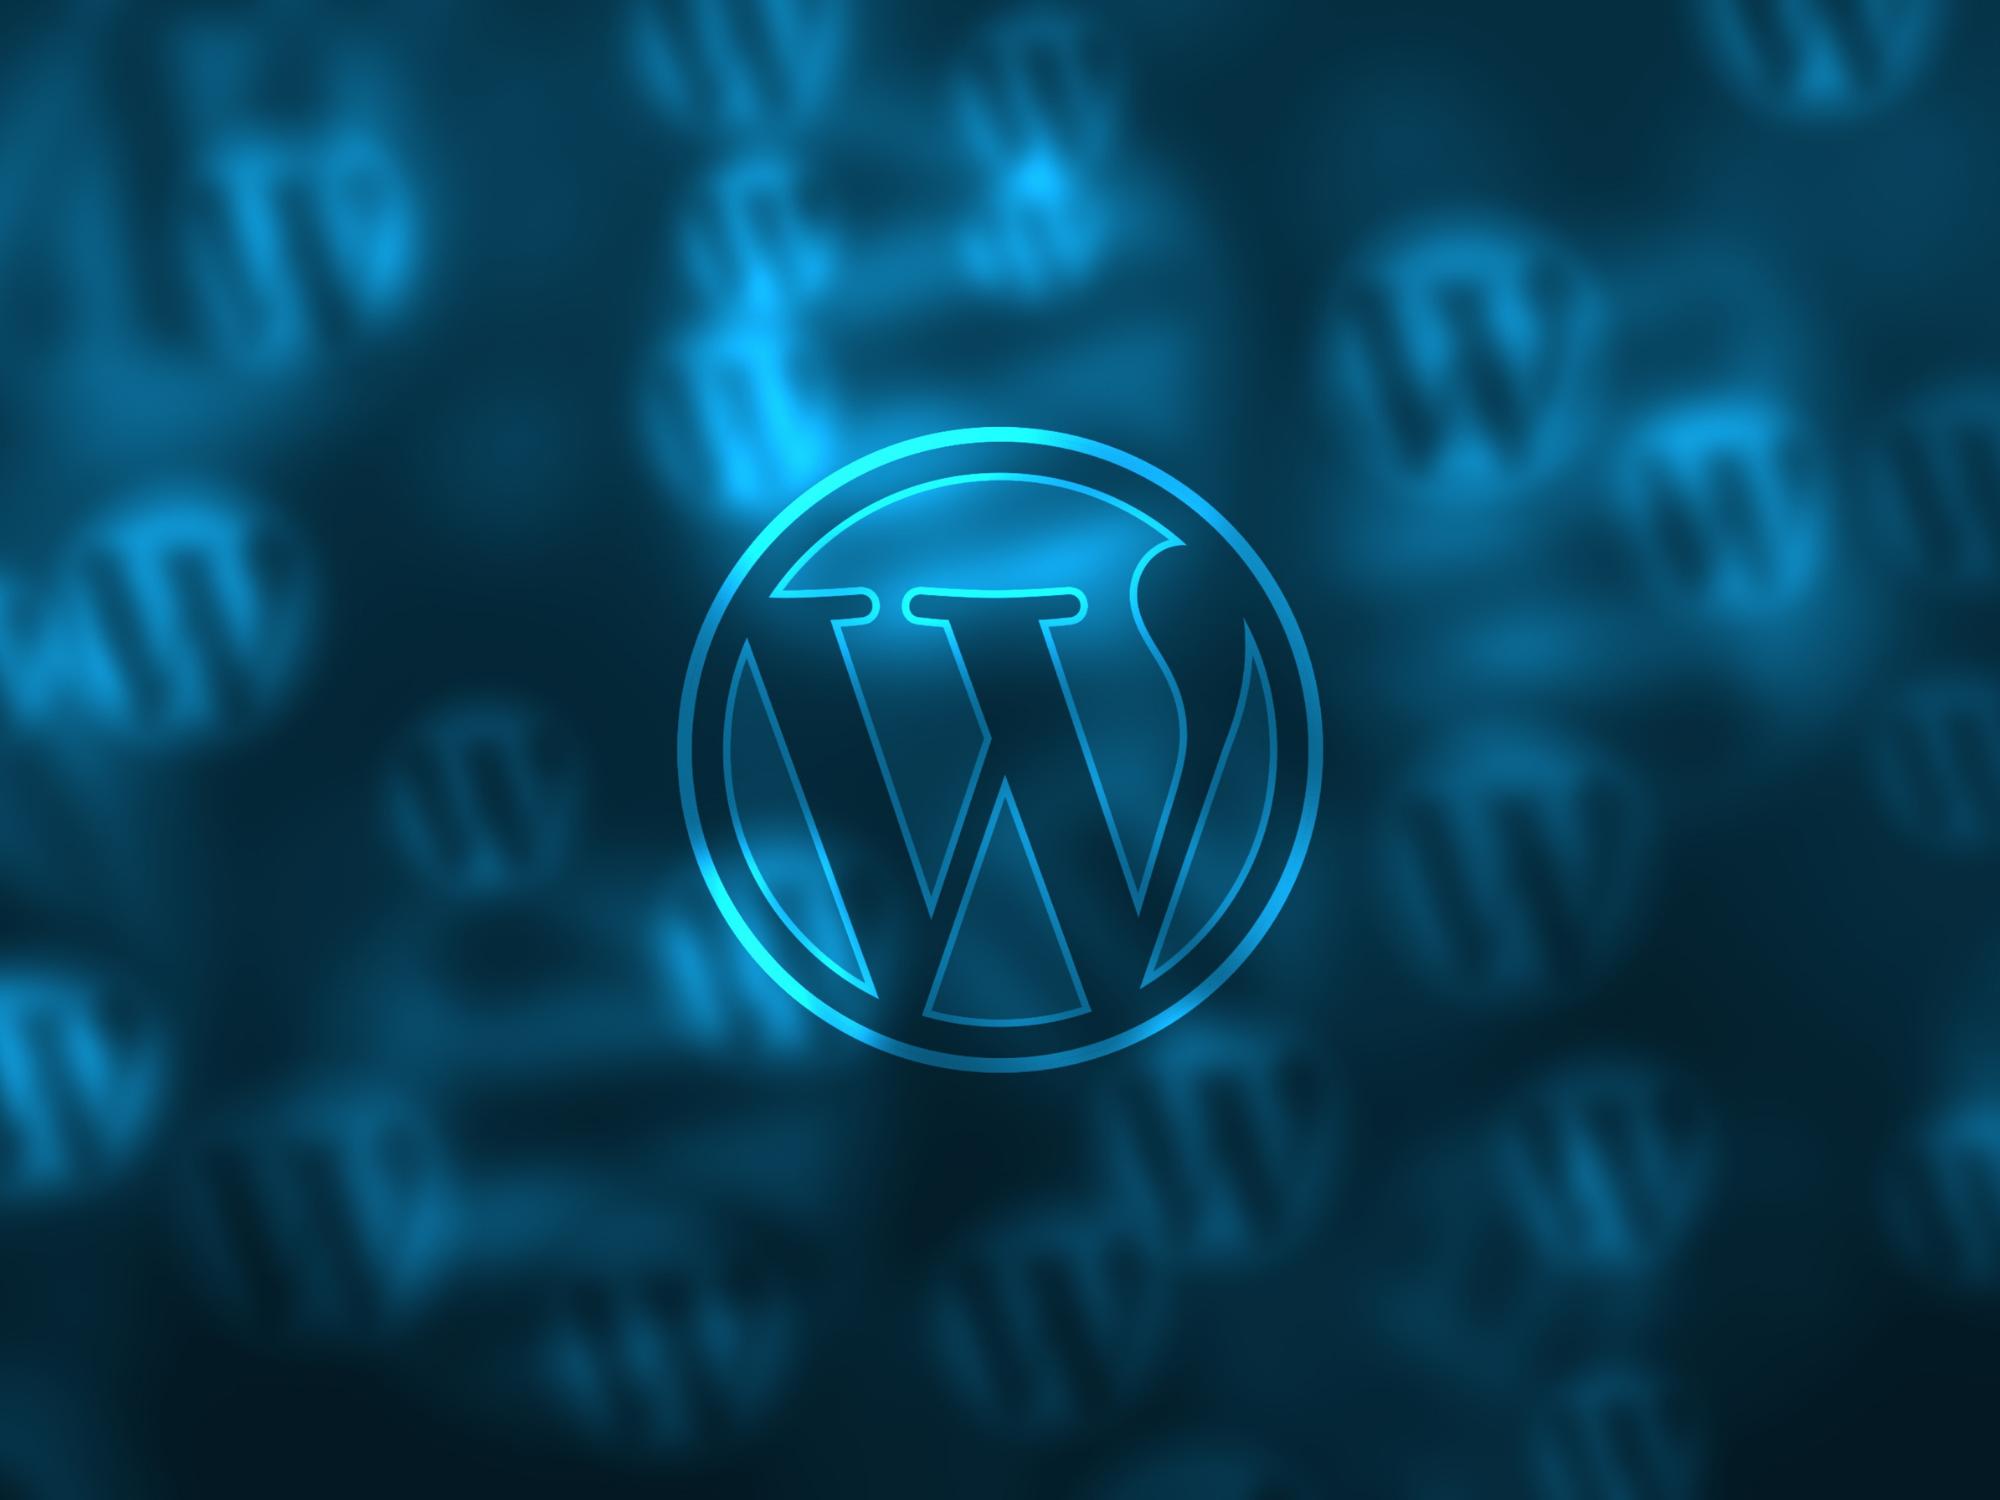 WordPress.com vs WordPress.org WordPress